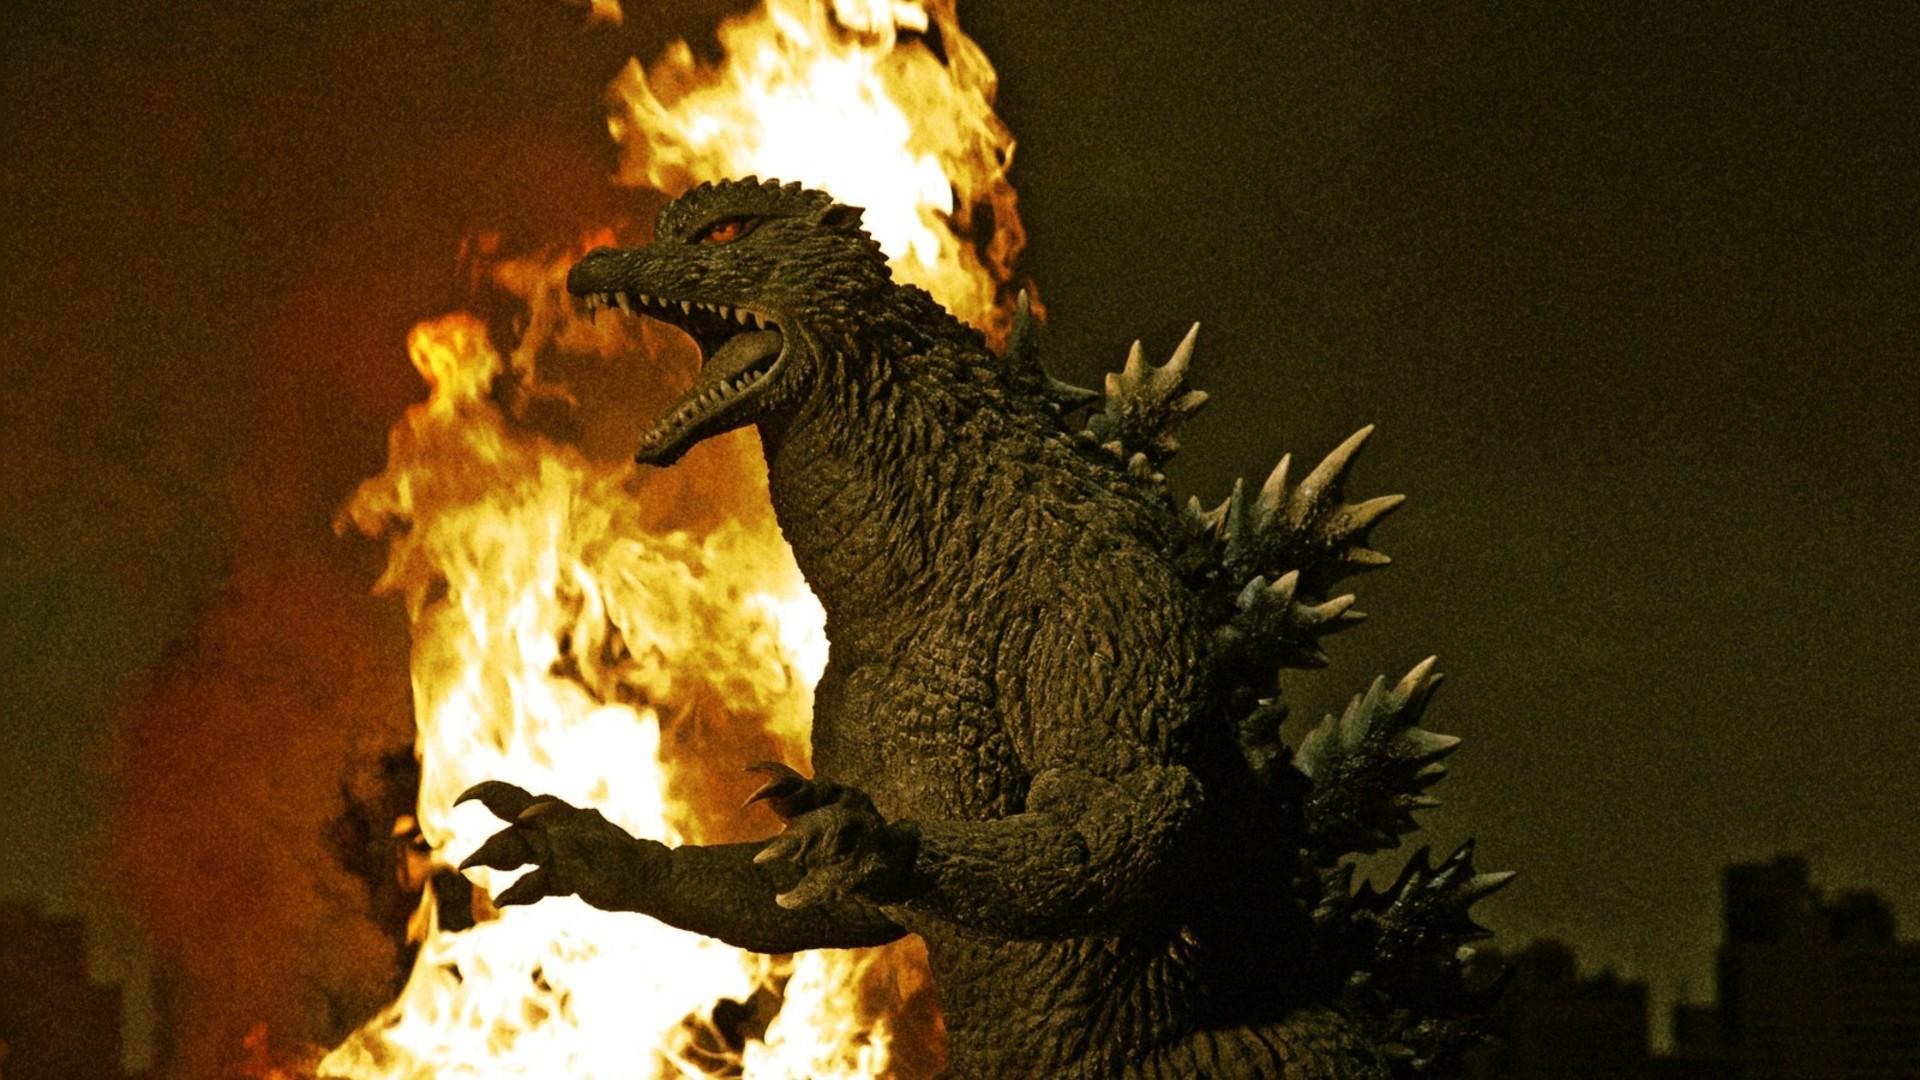 Godzilla Monsters HD Wide Wallpaper for Widescreen (65 Wallpapers) – HD  Wallpapers